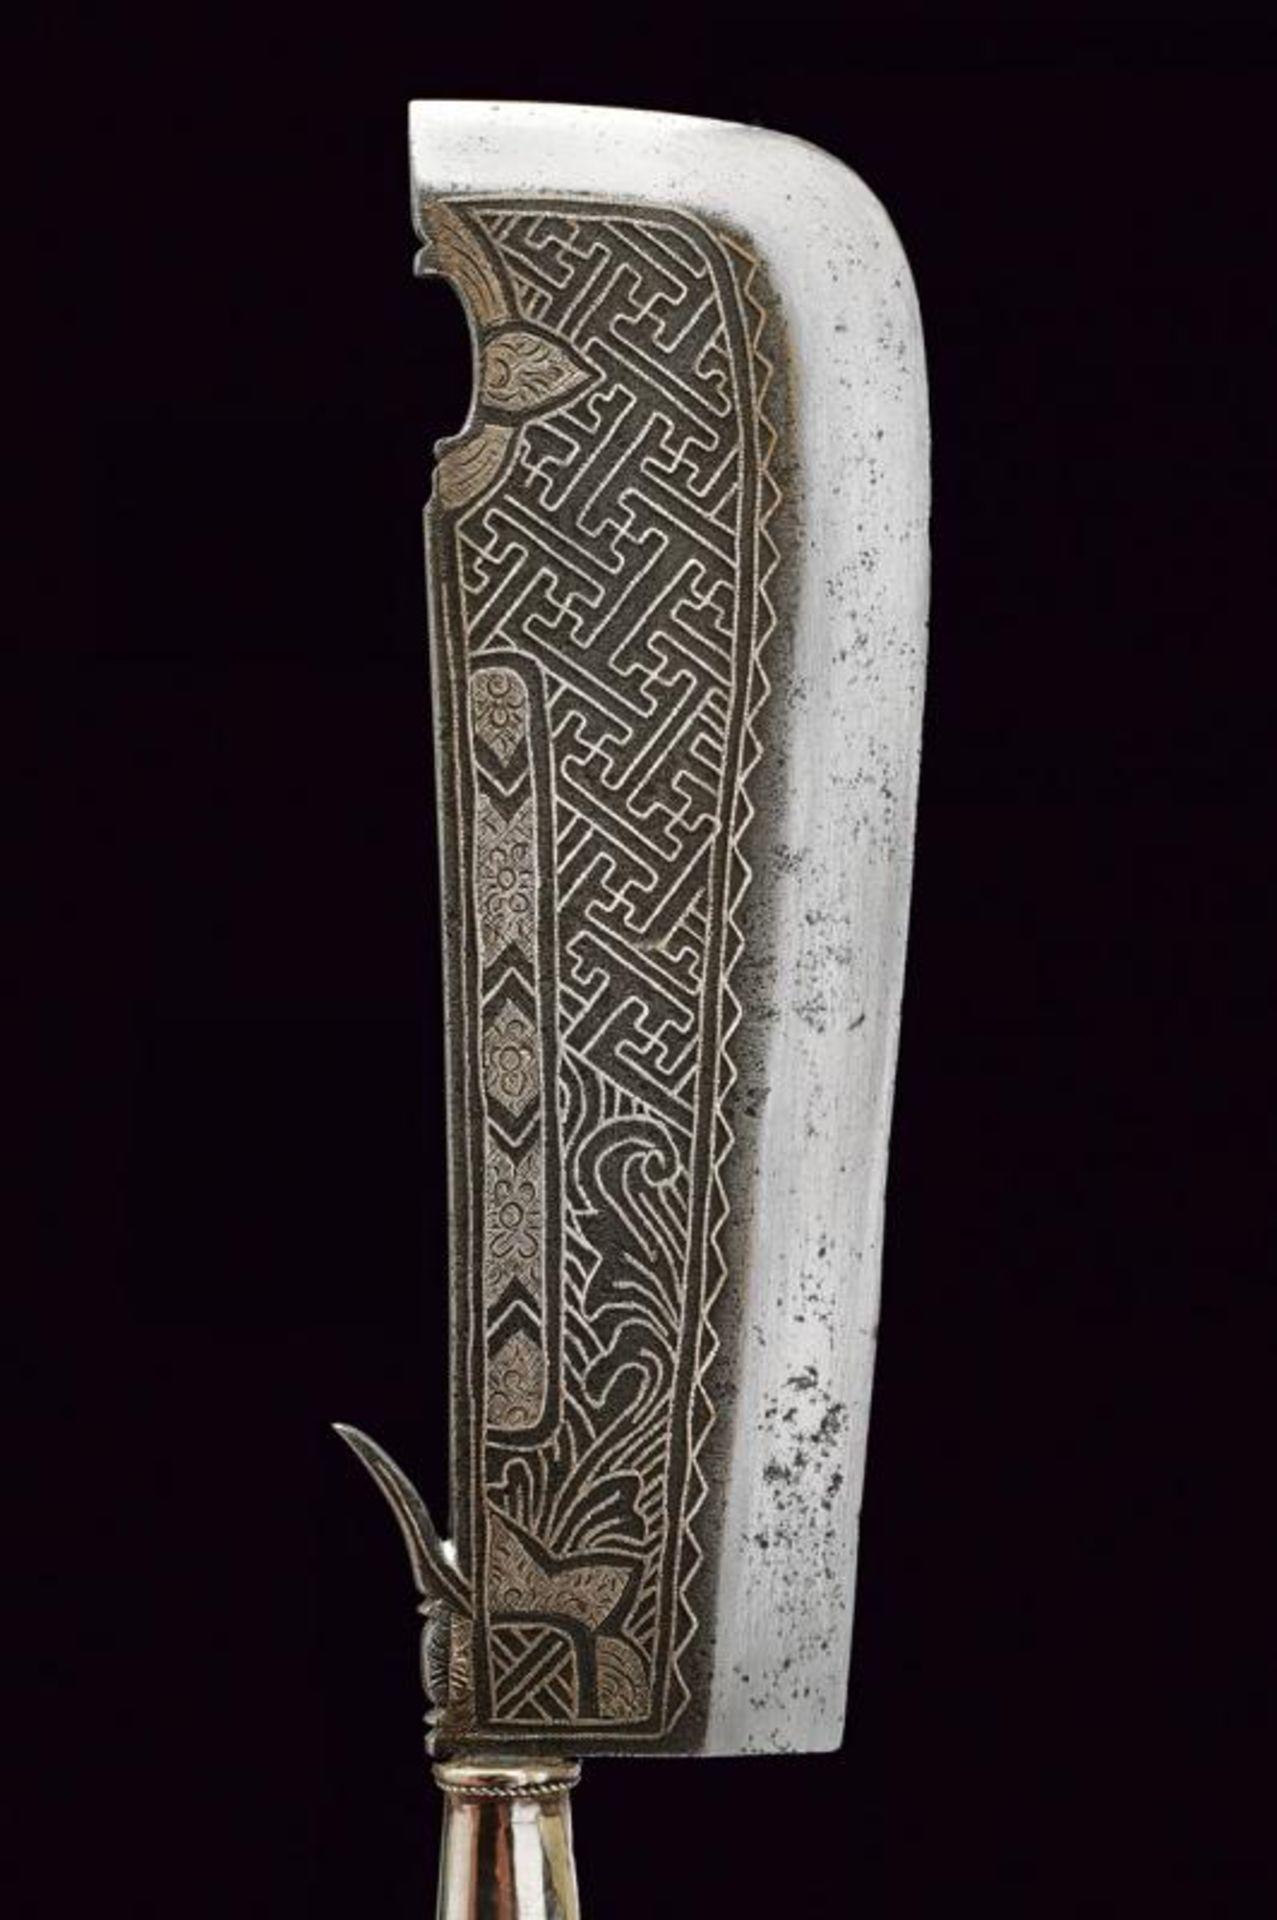 A ceremonial axe with silver hilt - Bild 5 aus 6